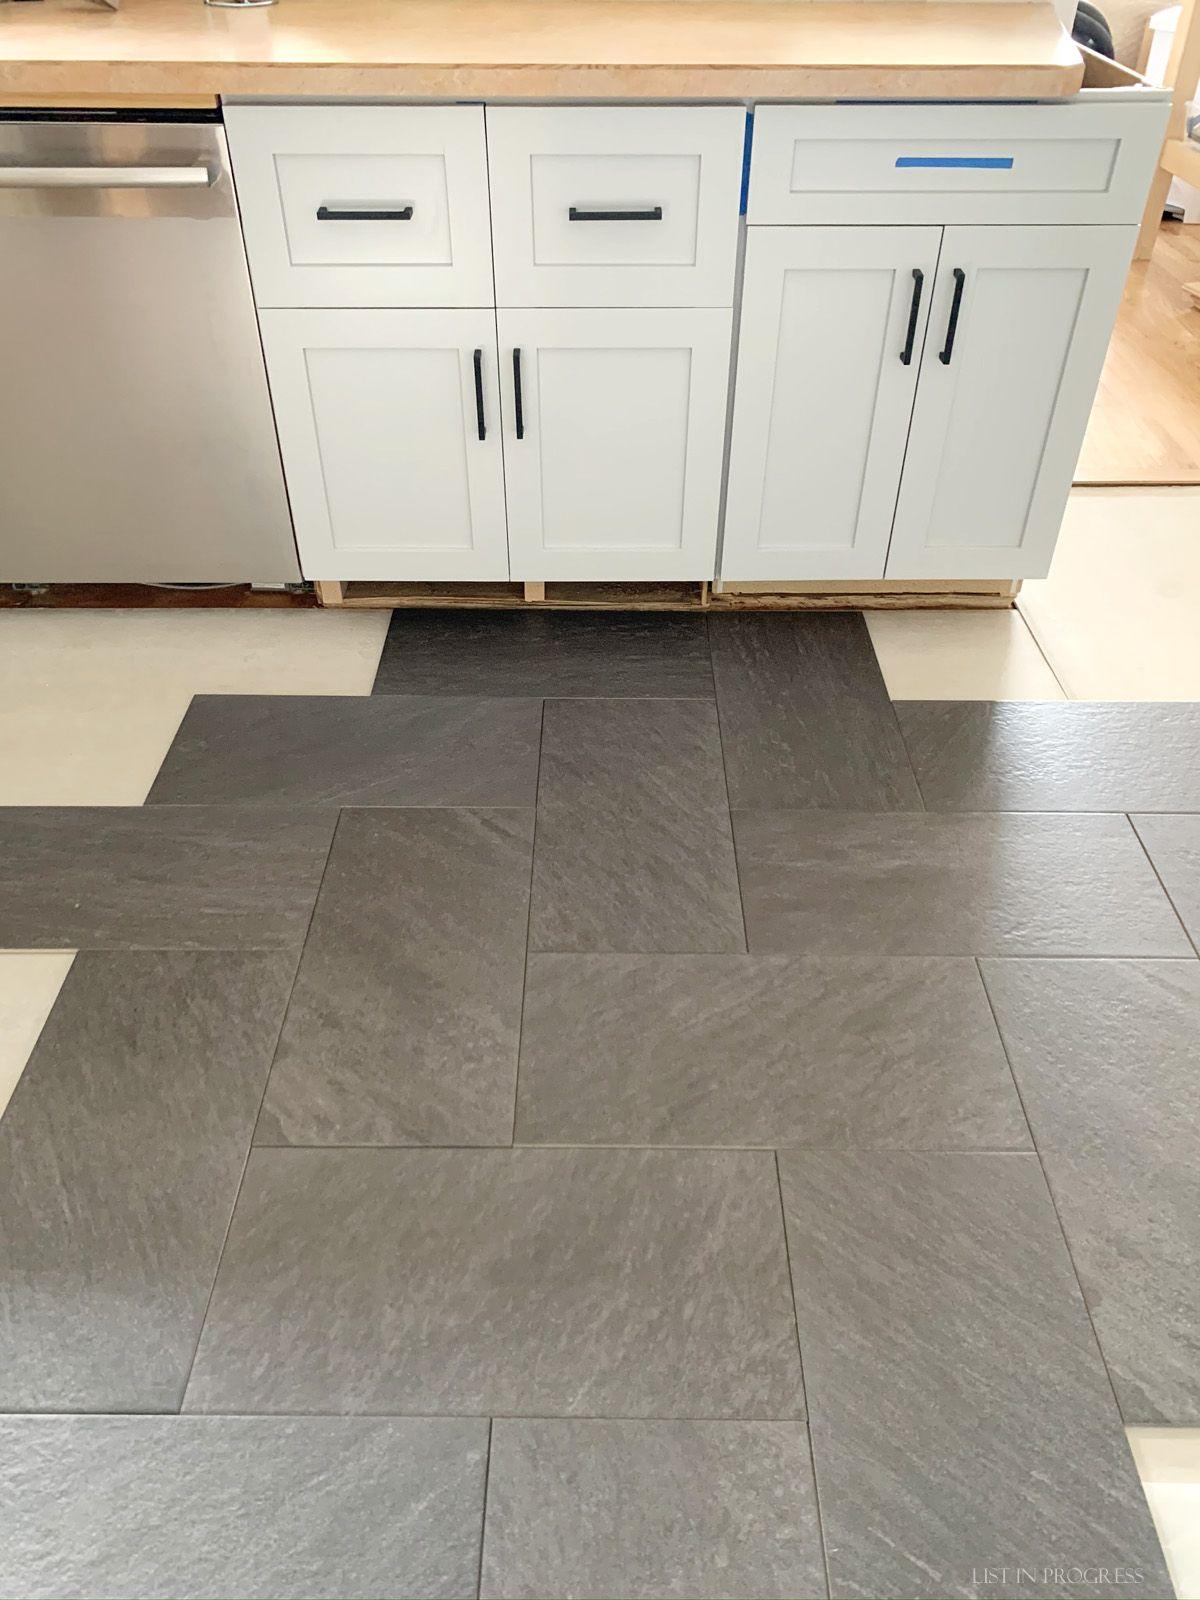 3 Kitchen Floor Tile Layouts Patterned Kitchen Tiles Kitchen Floor Tile Kitchen Floor Tile Patterns